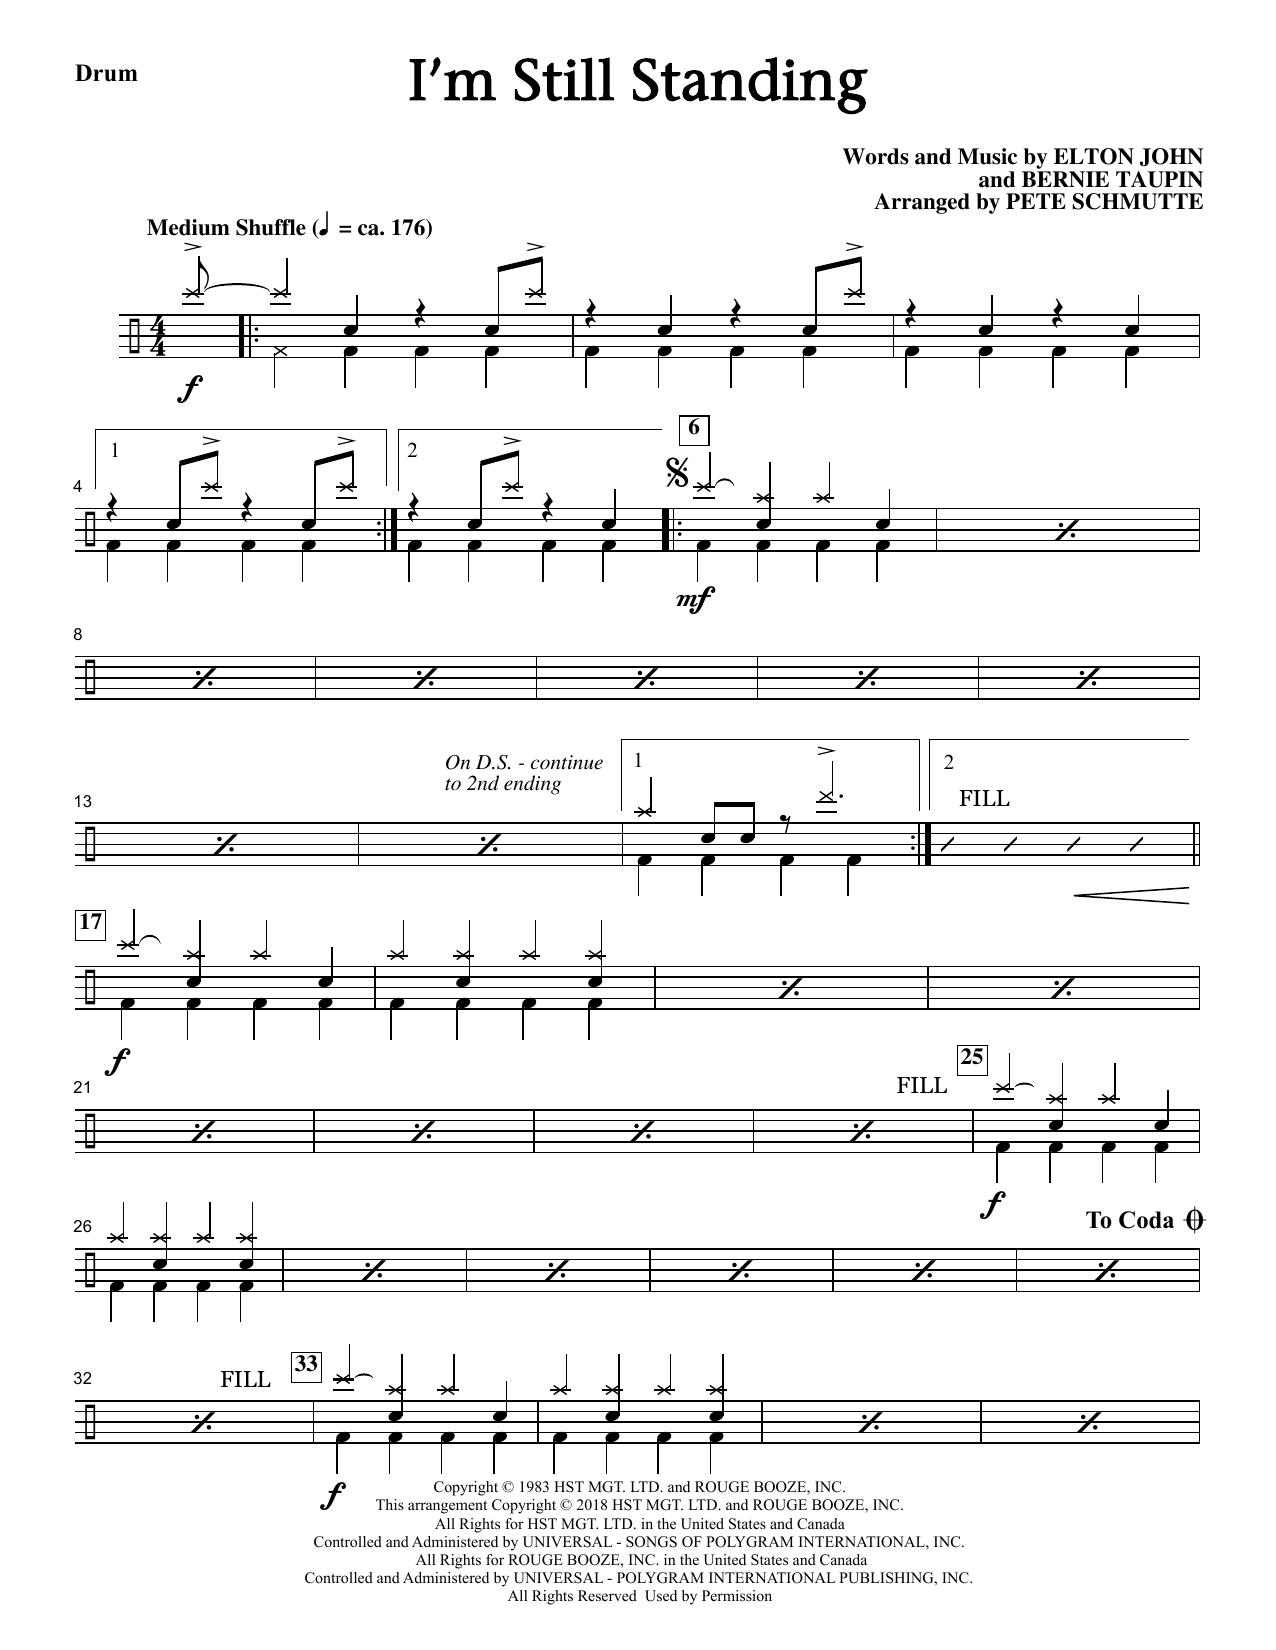 Elton John I'm Still Standing (arr. Pete Schmutte) - Drums sheet music notes and chords